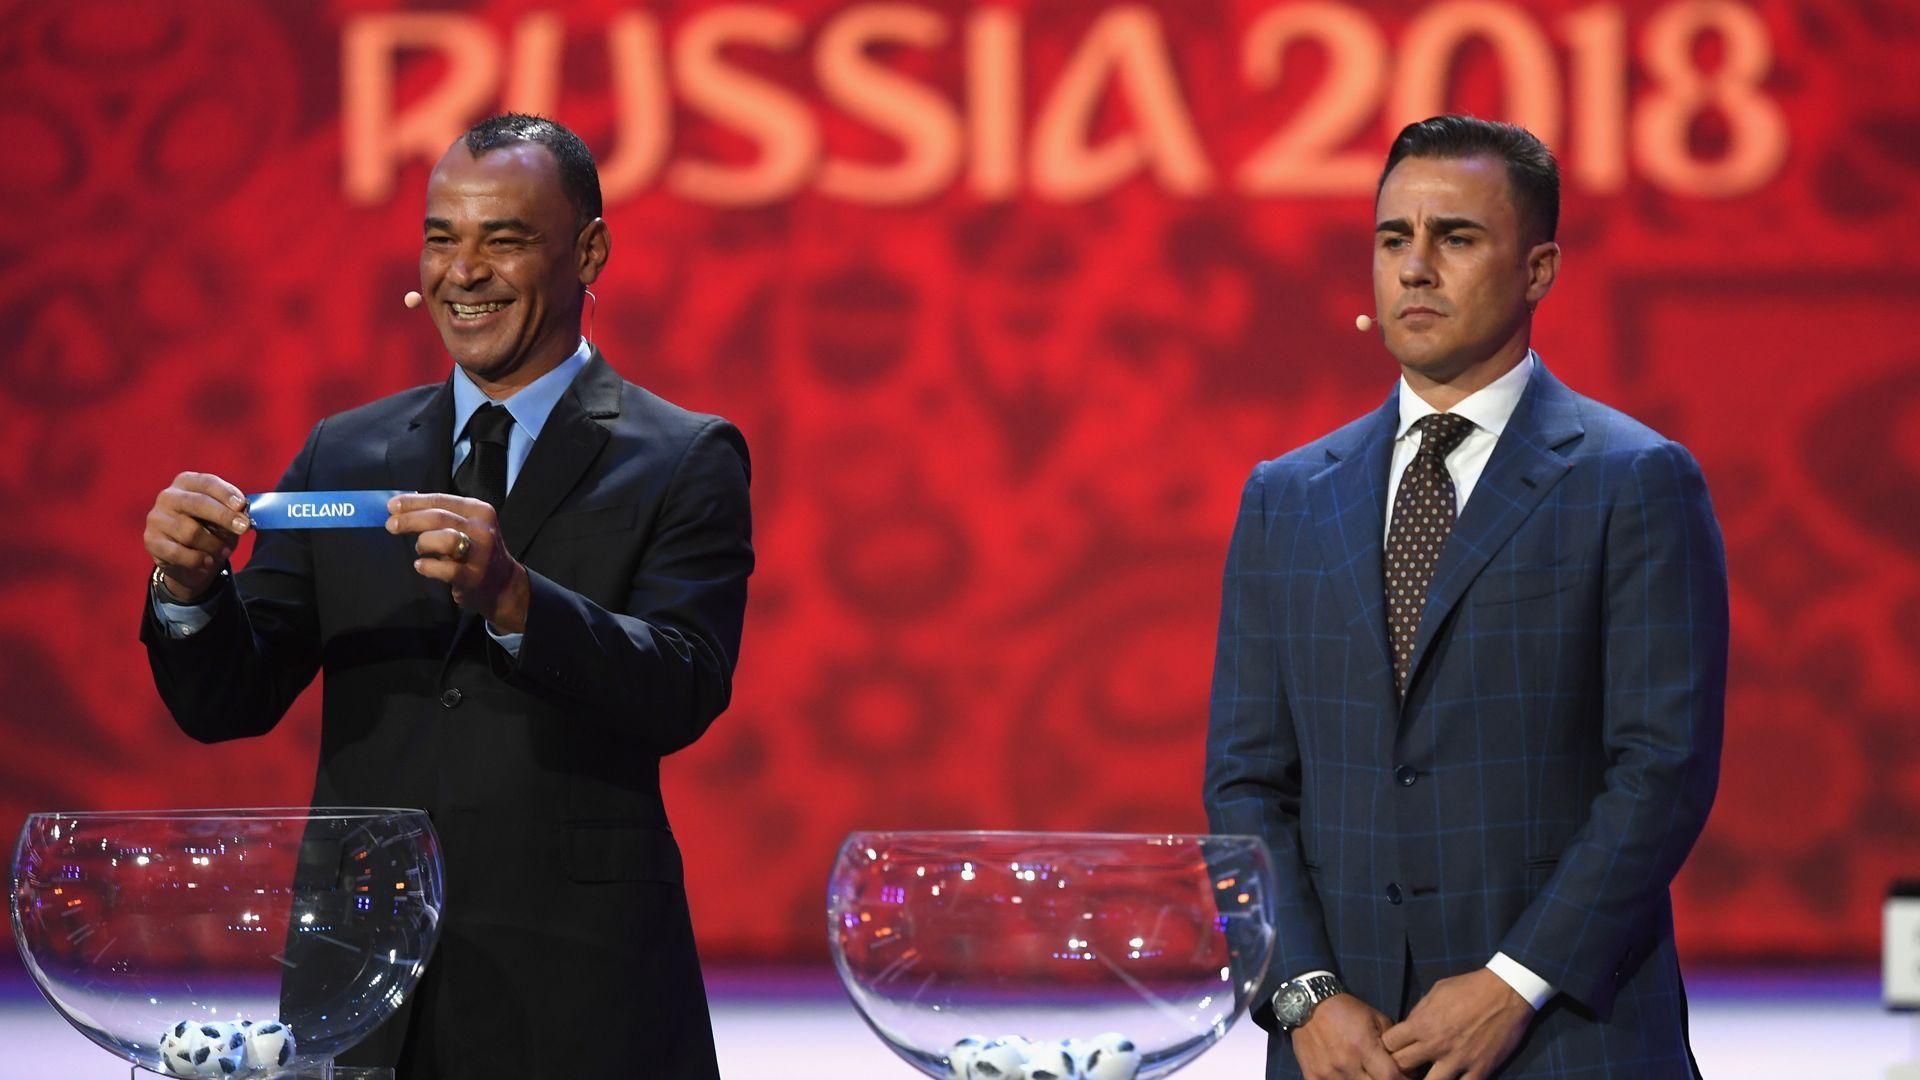 Fabio Cannavaro Cafu Iceland FIFA World Cup 2018 draw